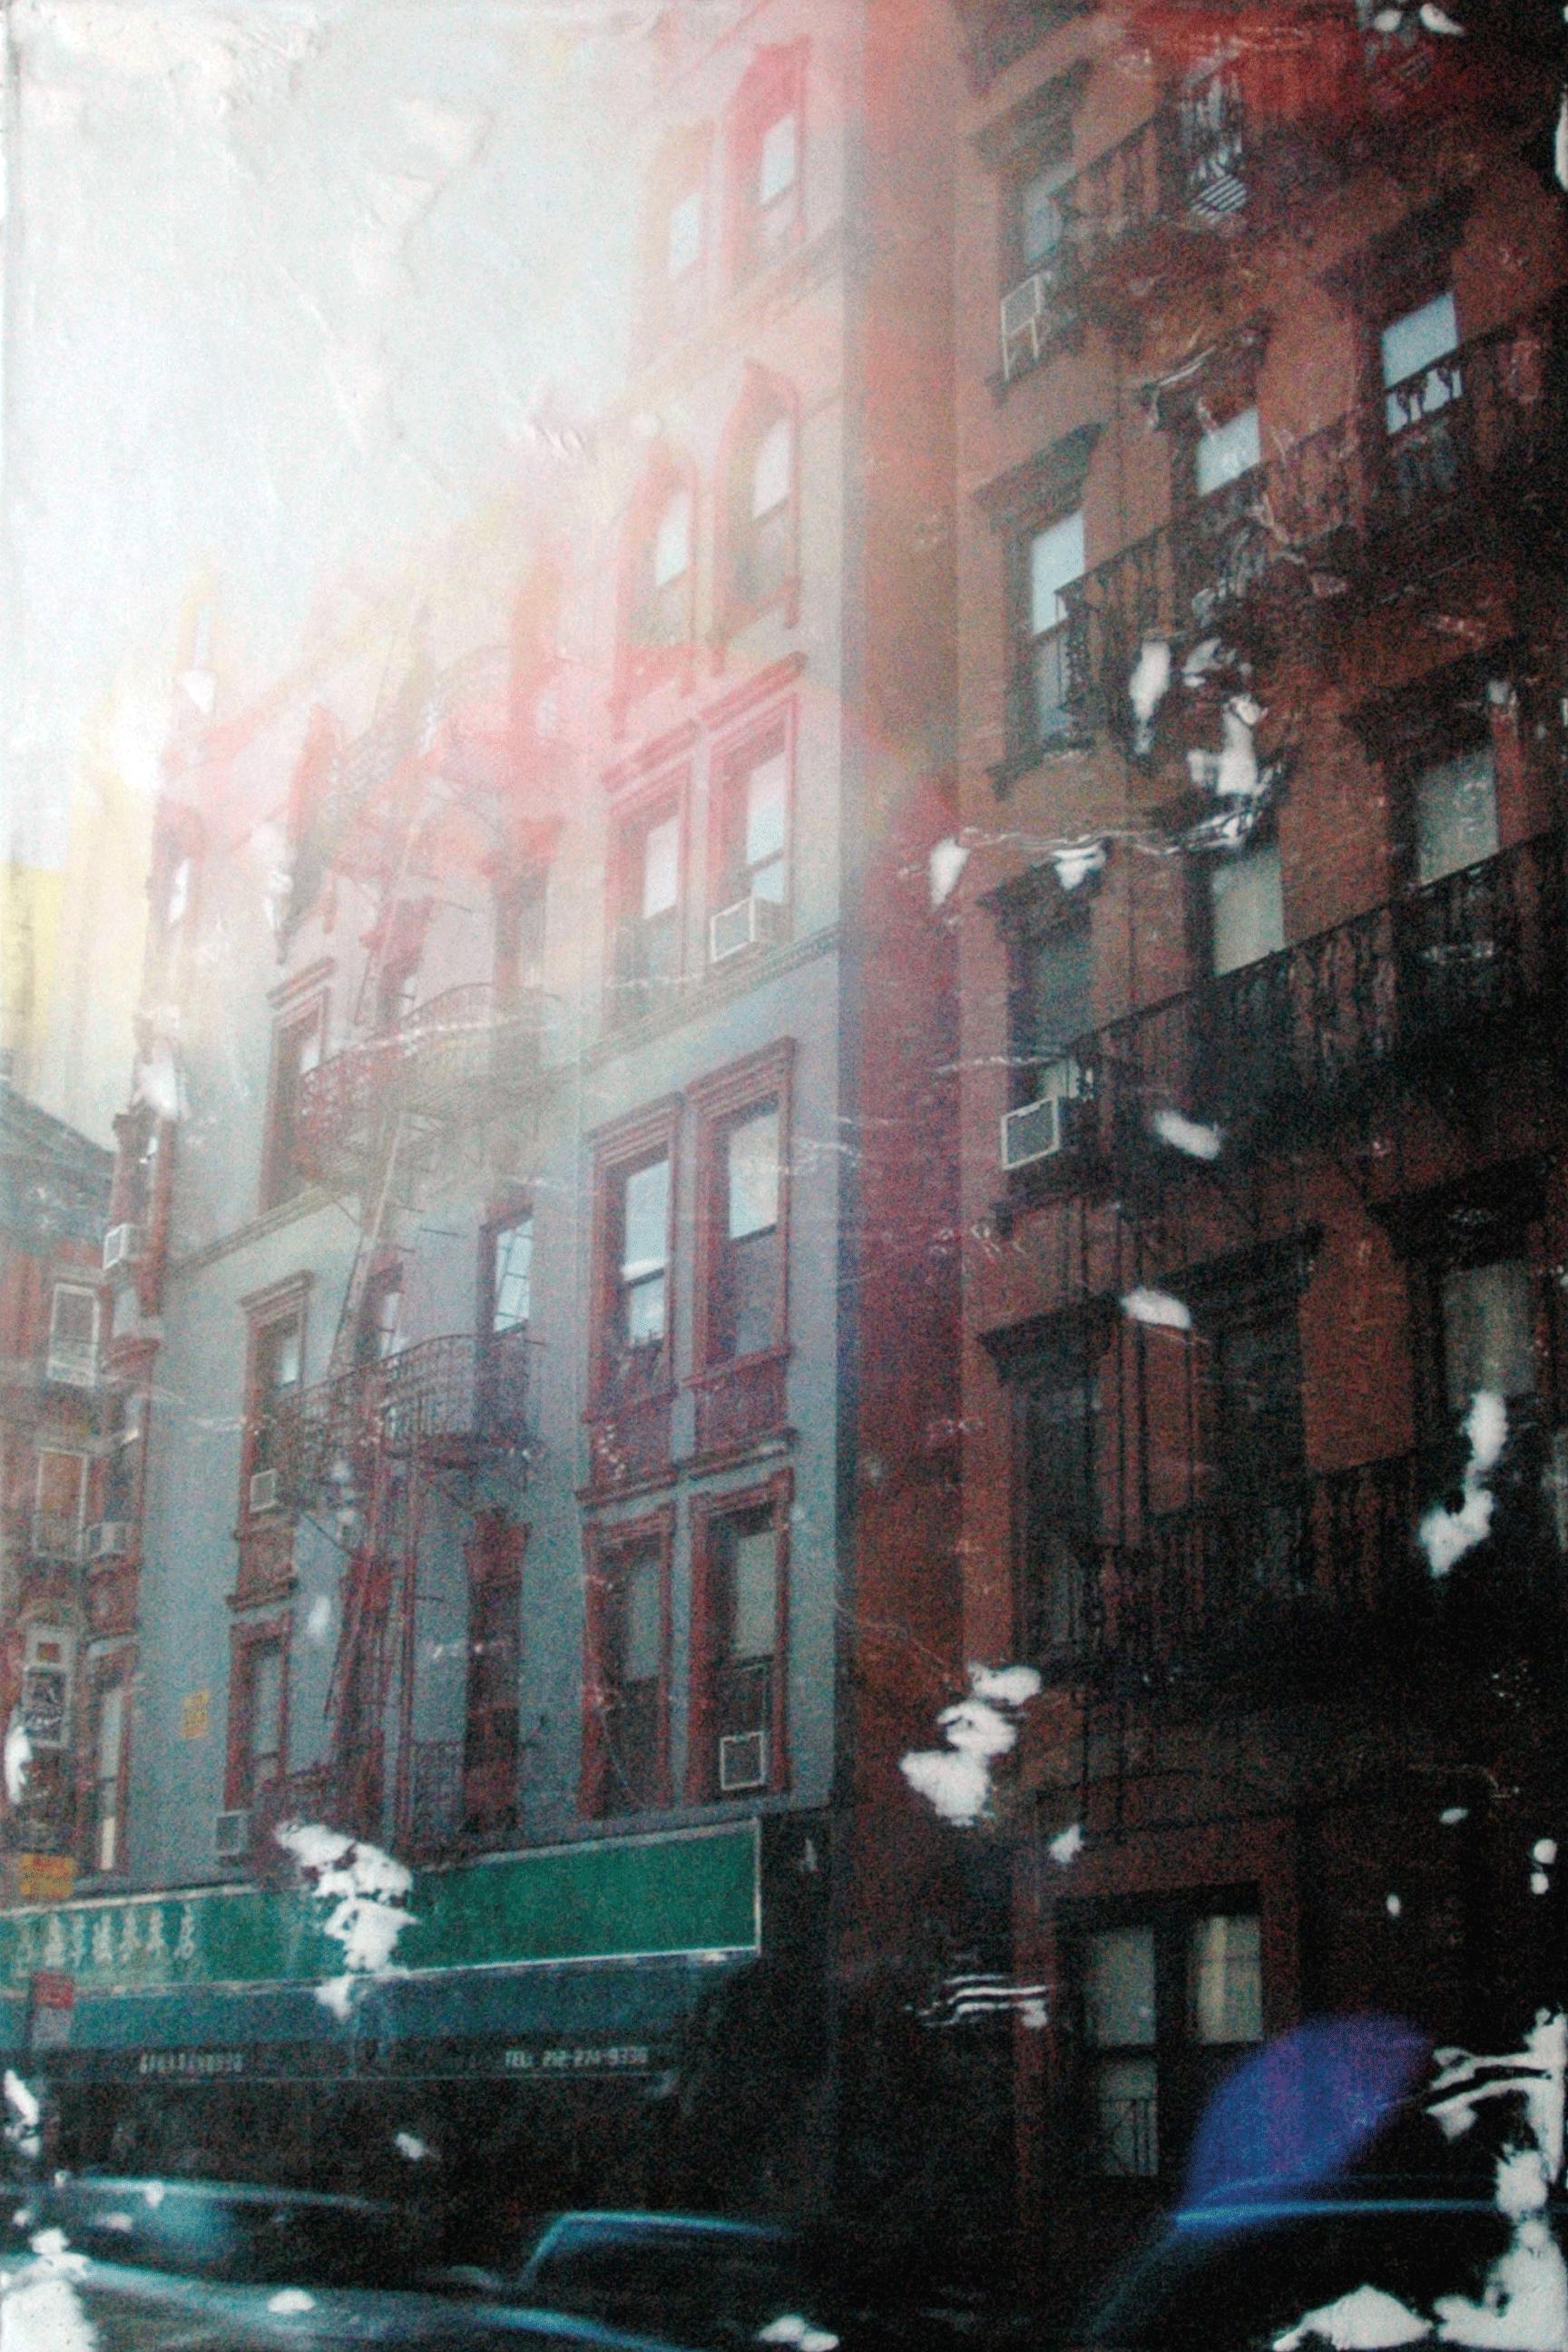 24x36_NYC_final_sm.png